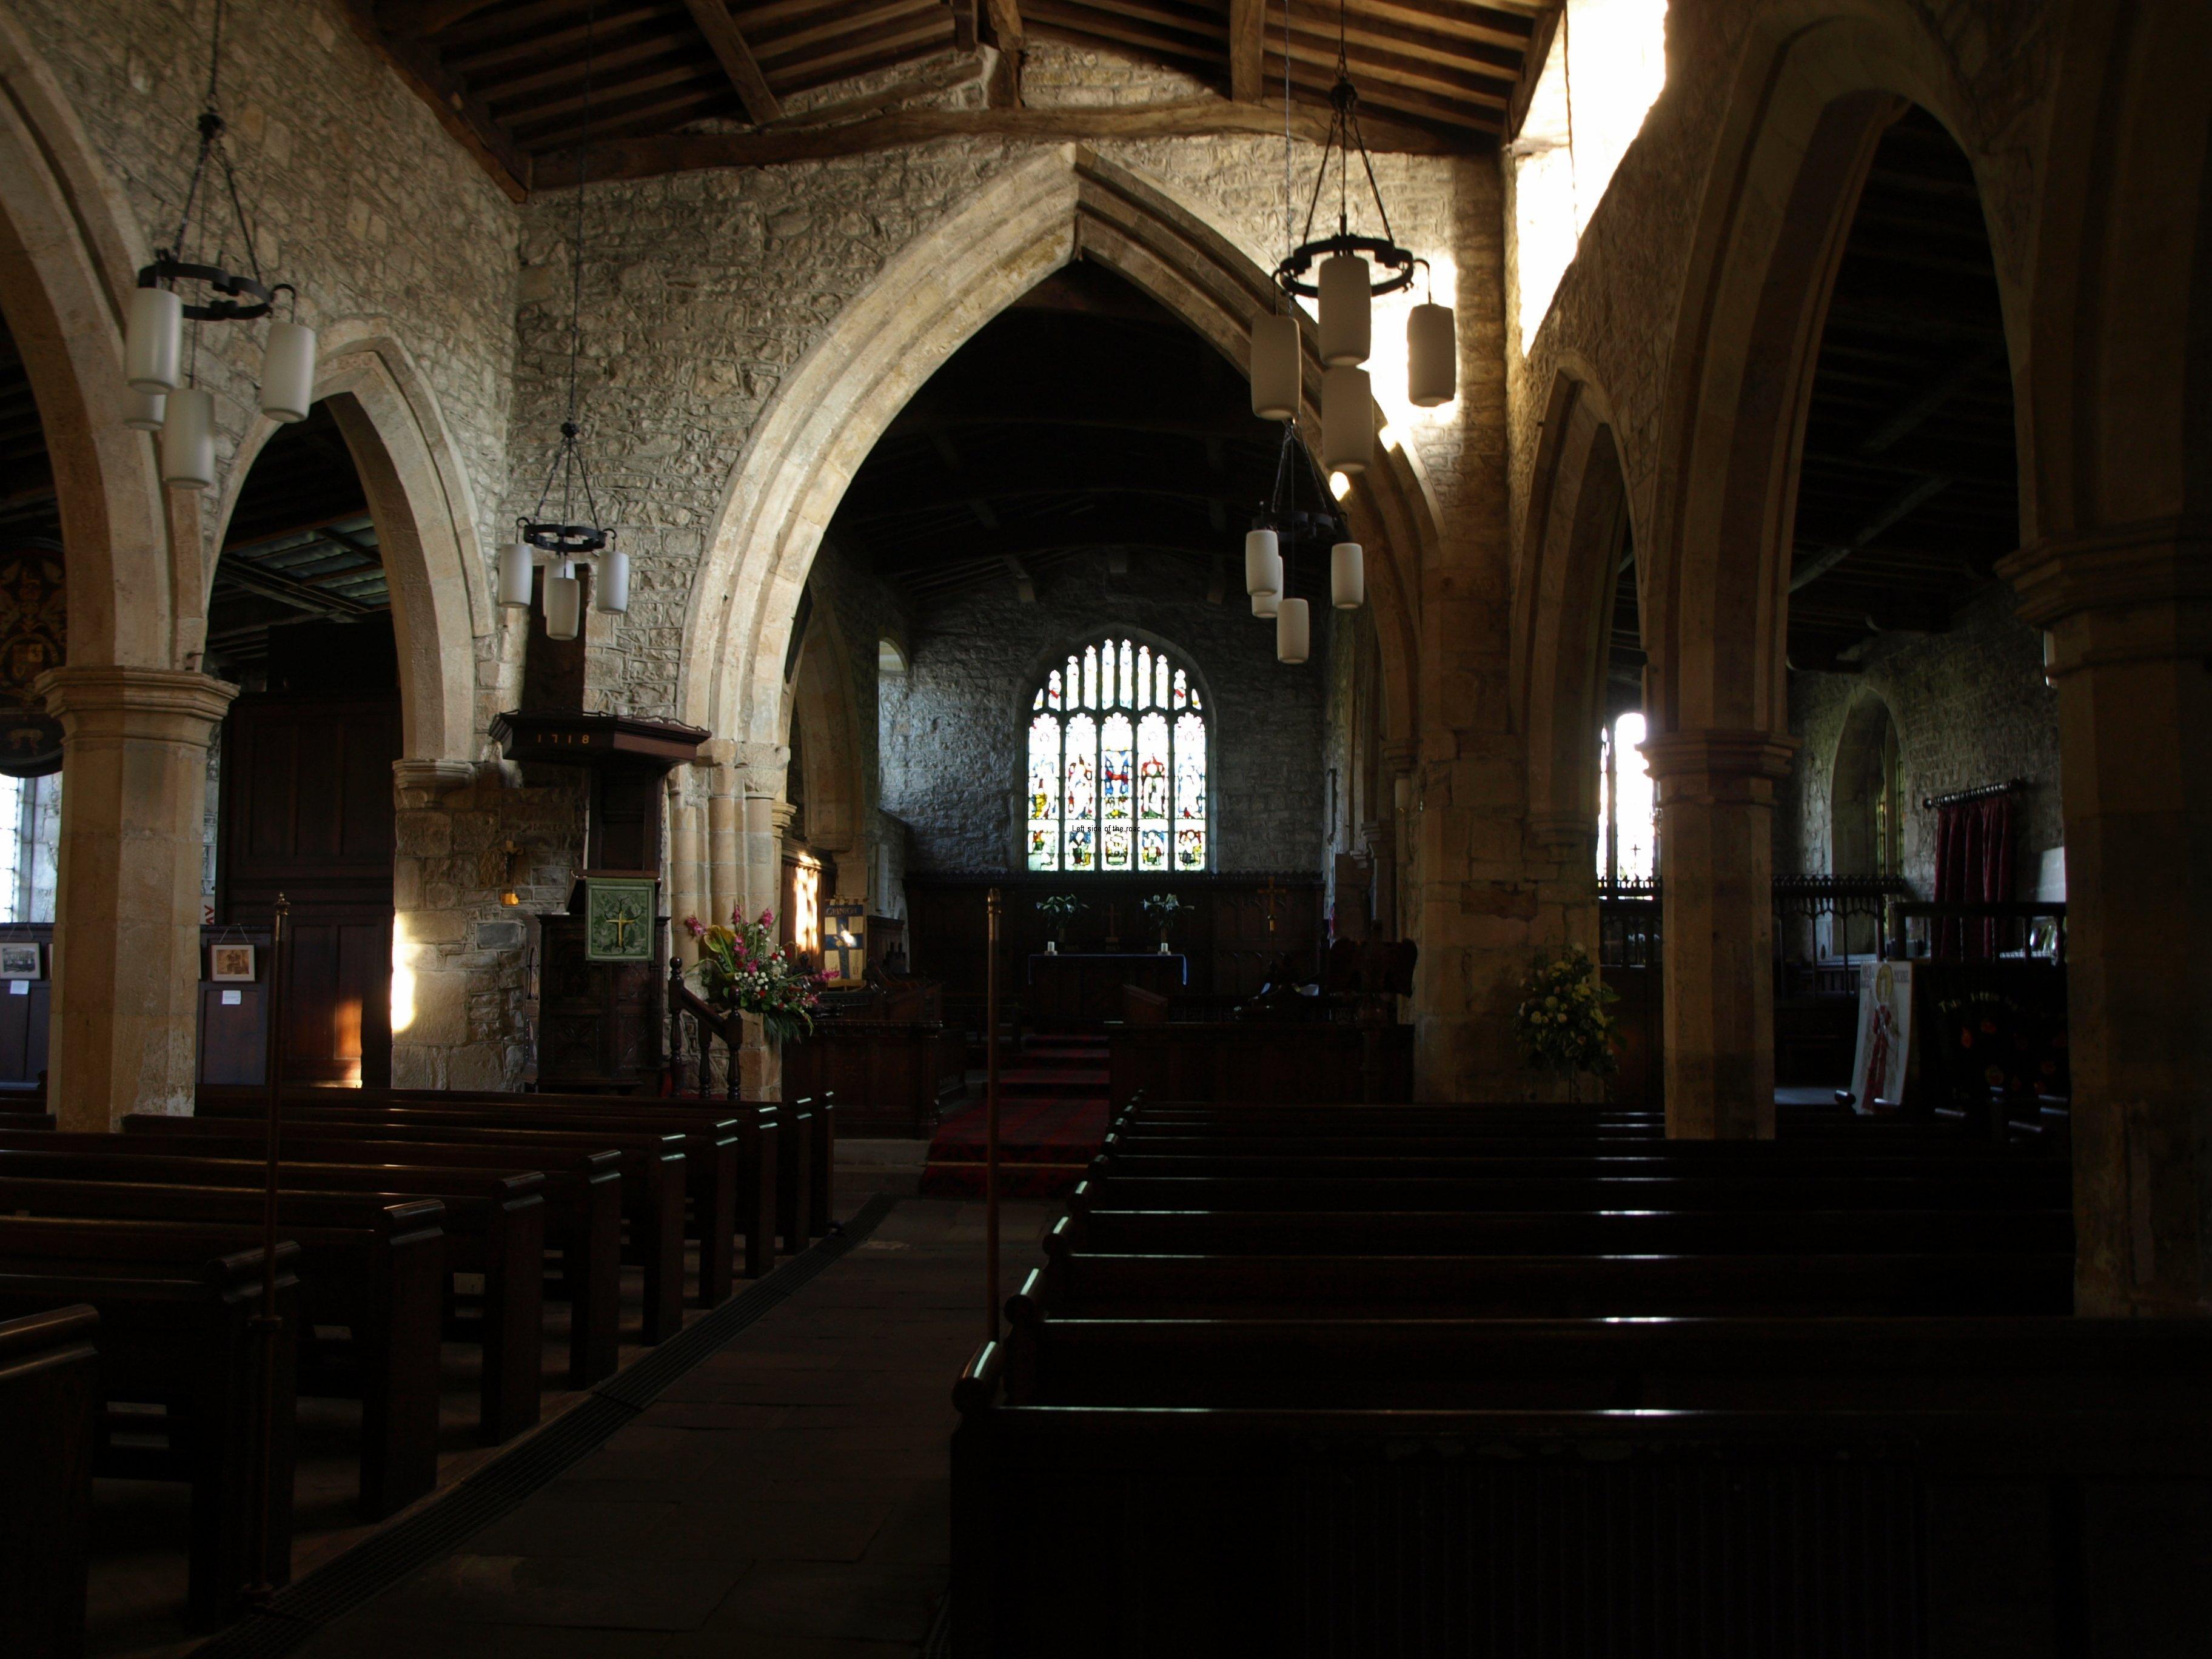 St Andrew's church, Grinton